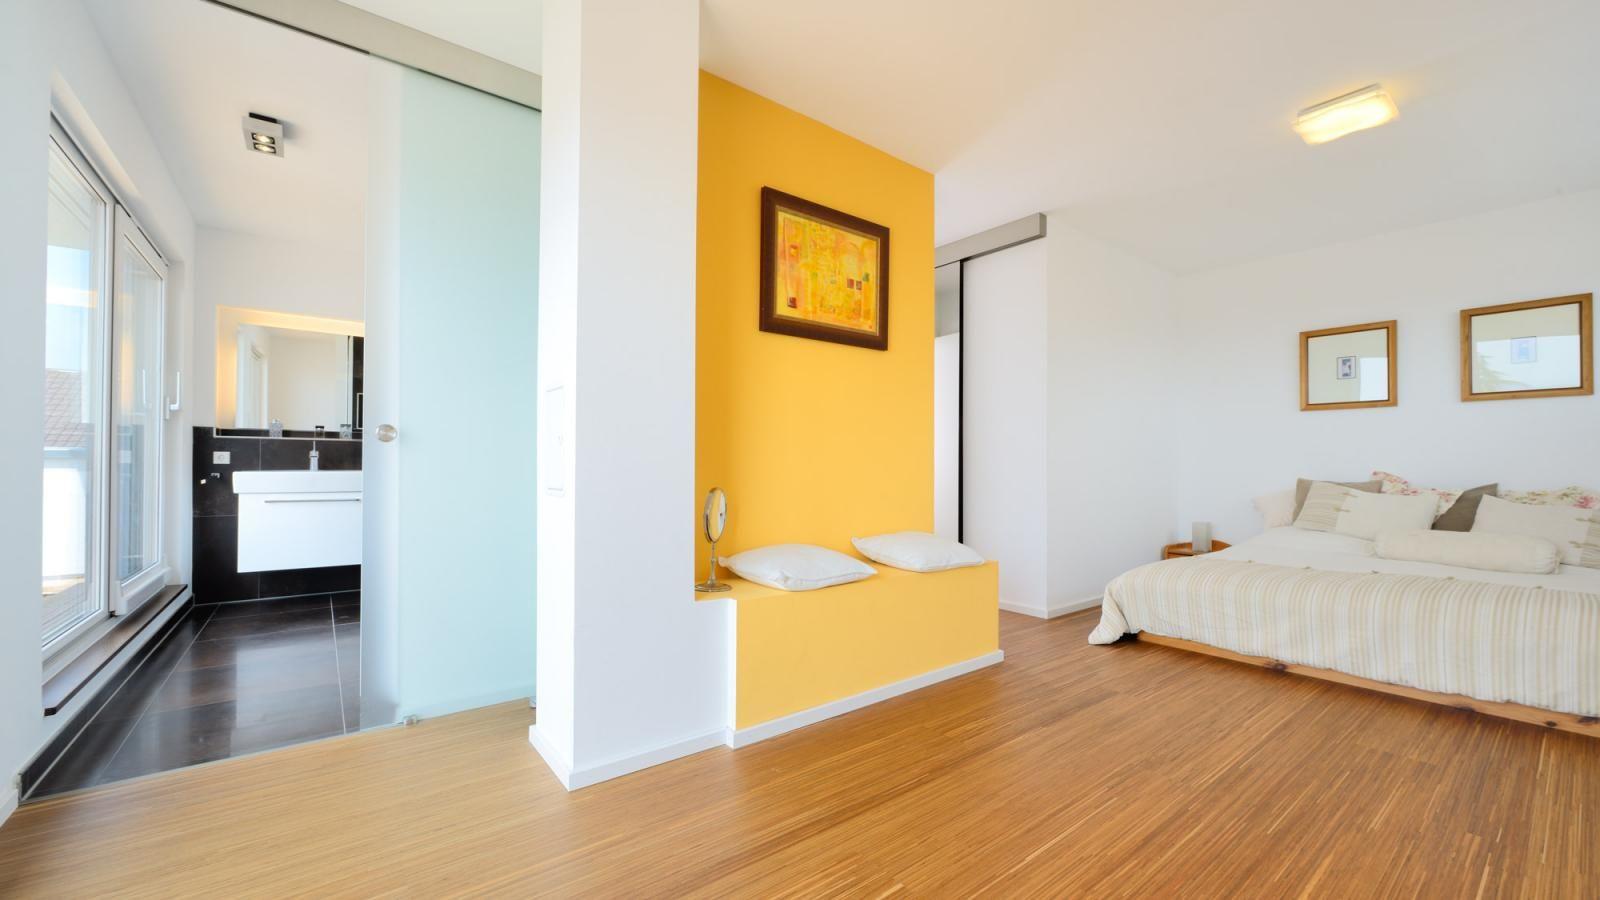 Master Bedroom Mit Bad En Suite Haus Richert Fertighaus